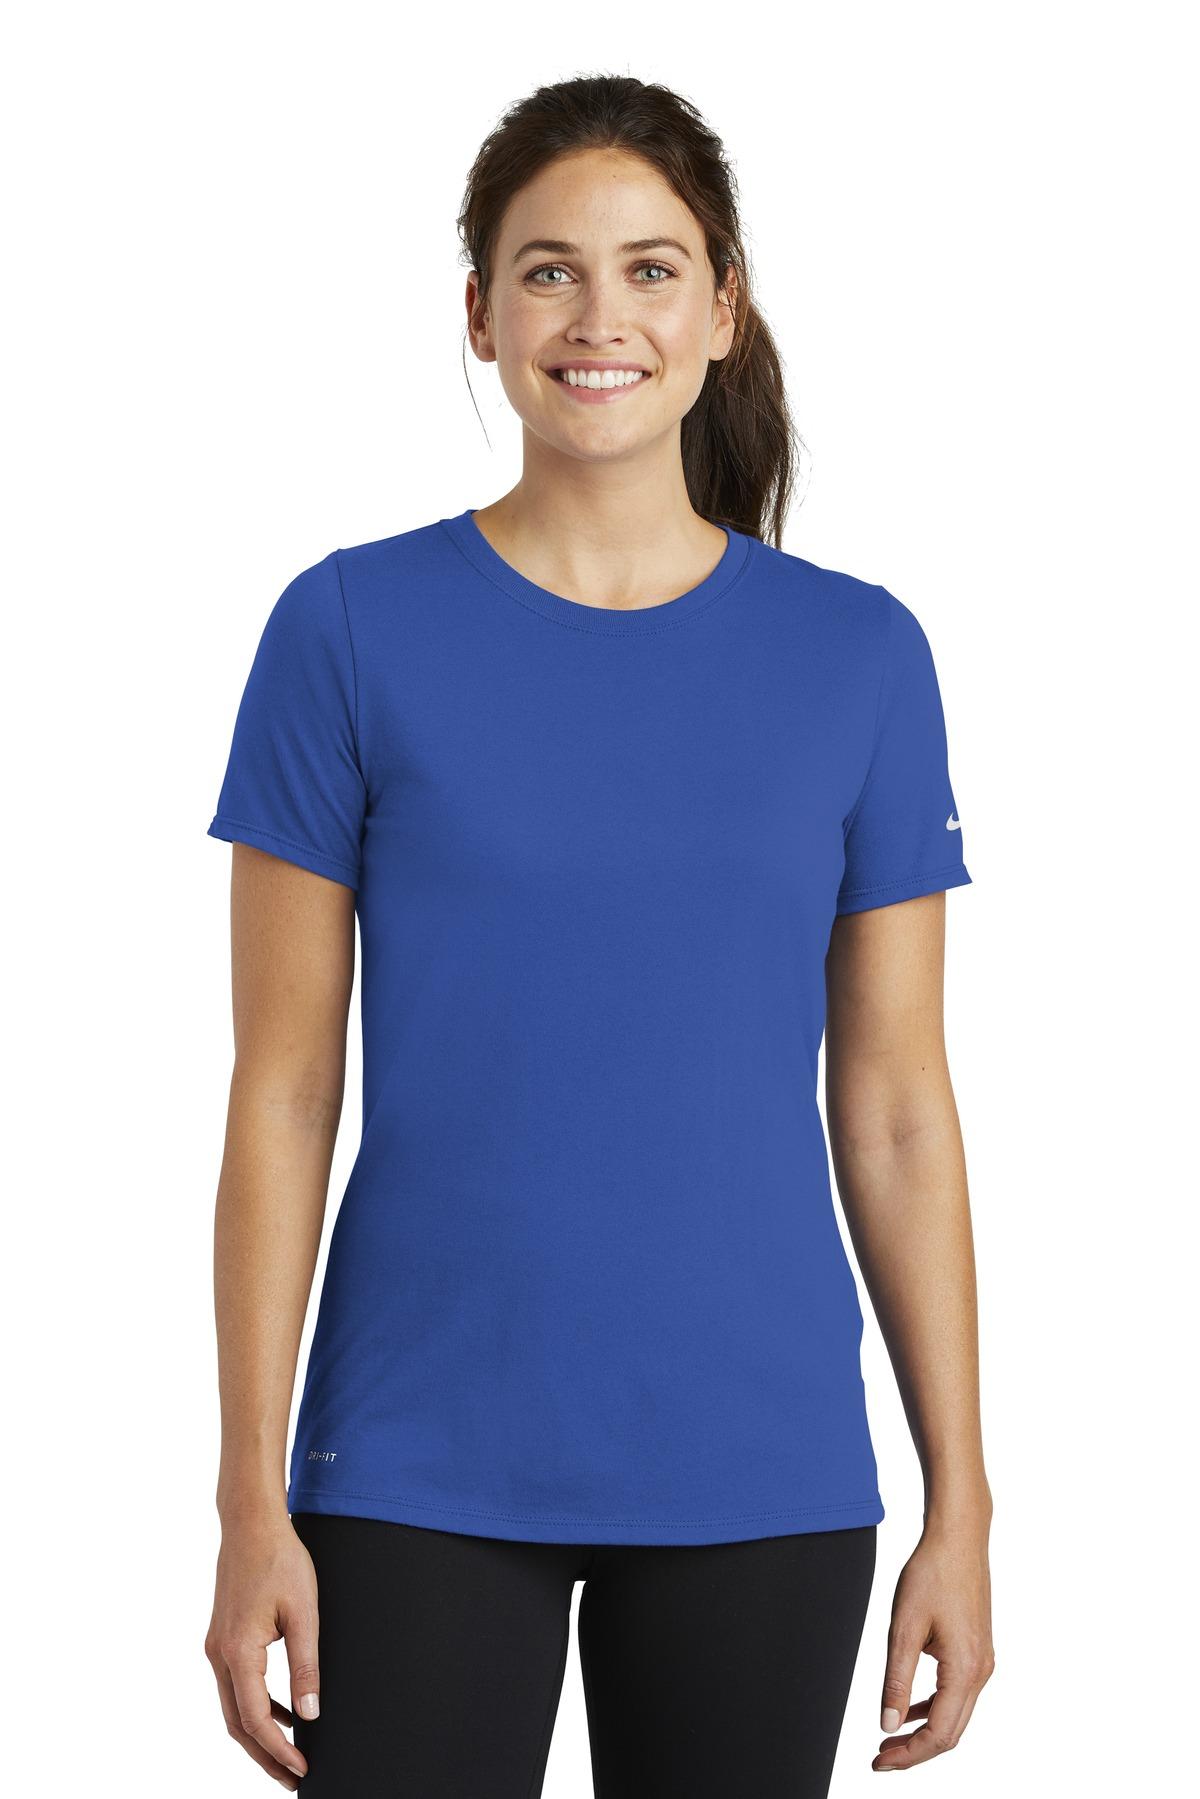 Nike Ladies Dri-FIT Cotton/Poly Scoop Neck Tee.-Nike